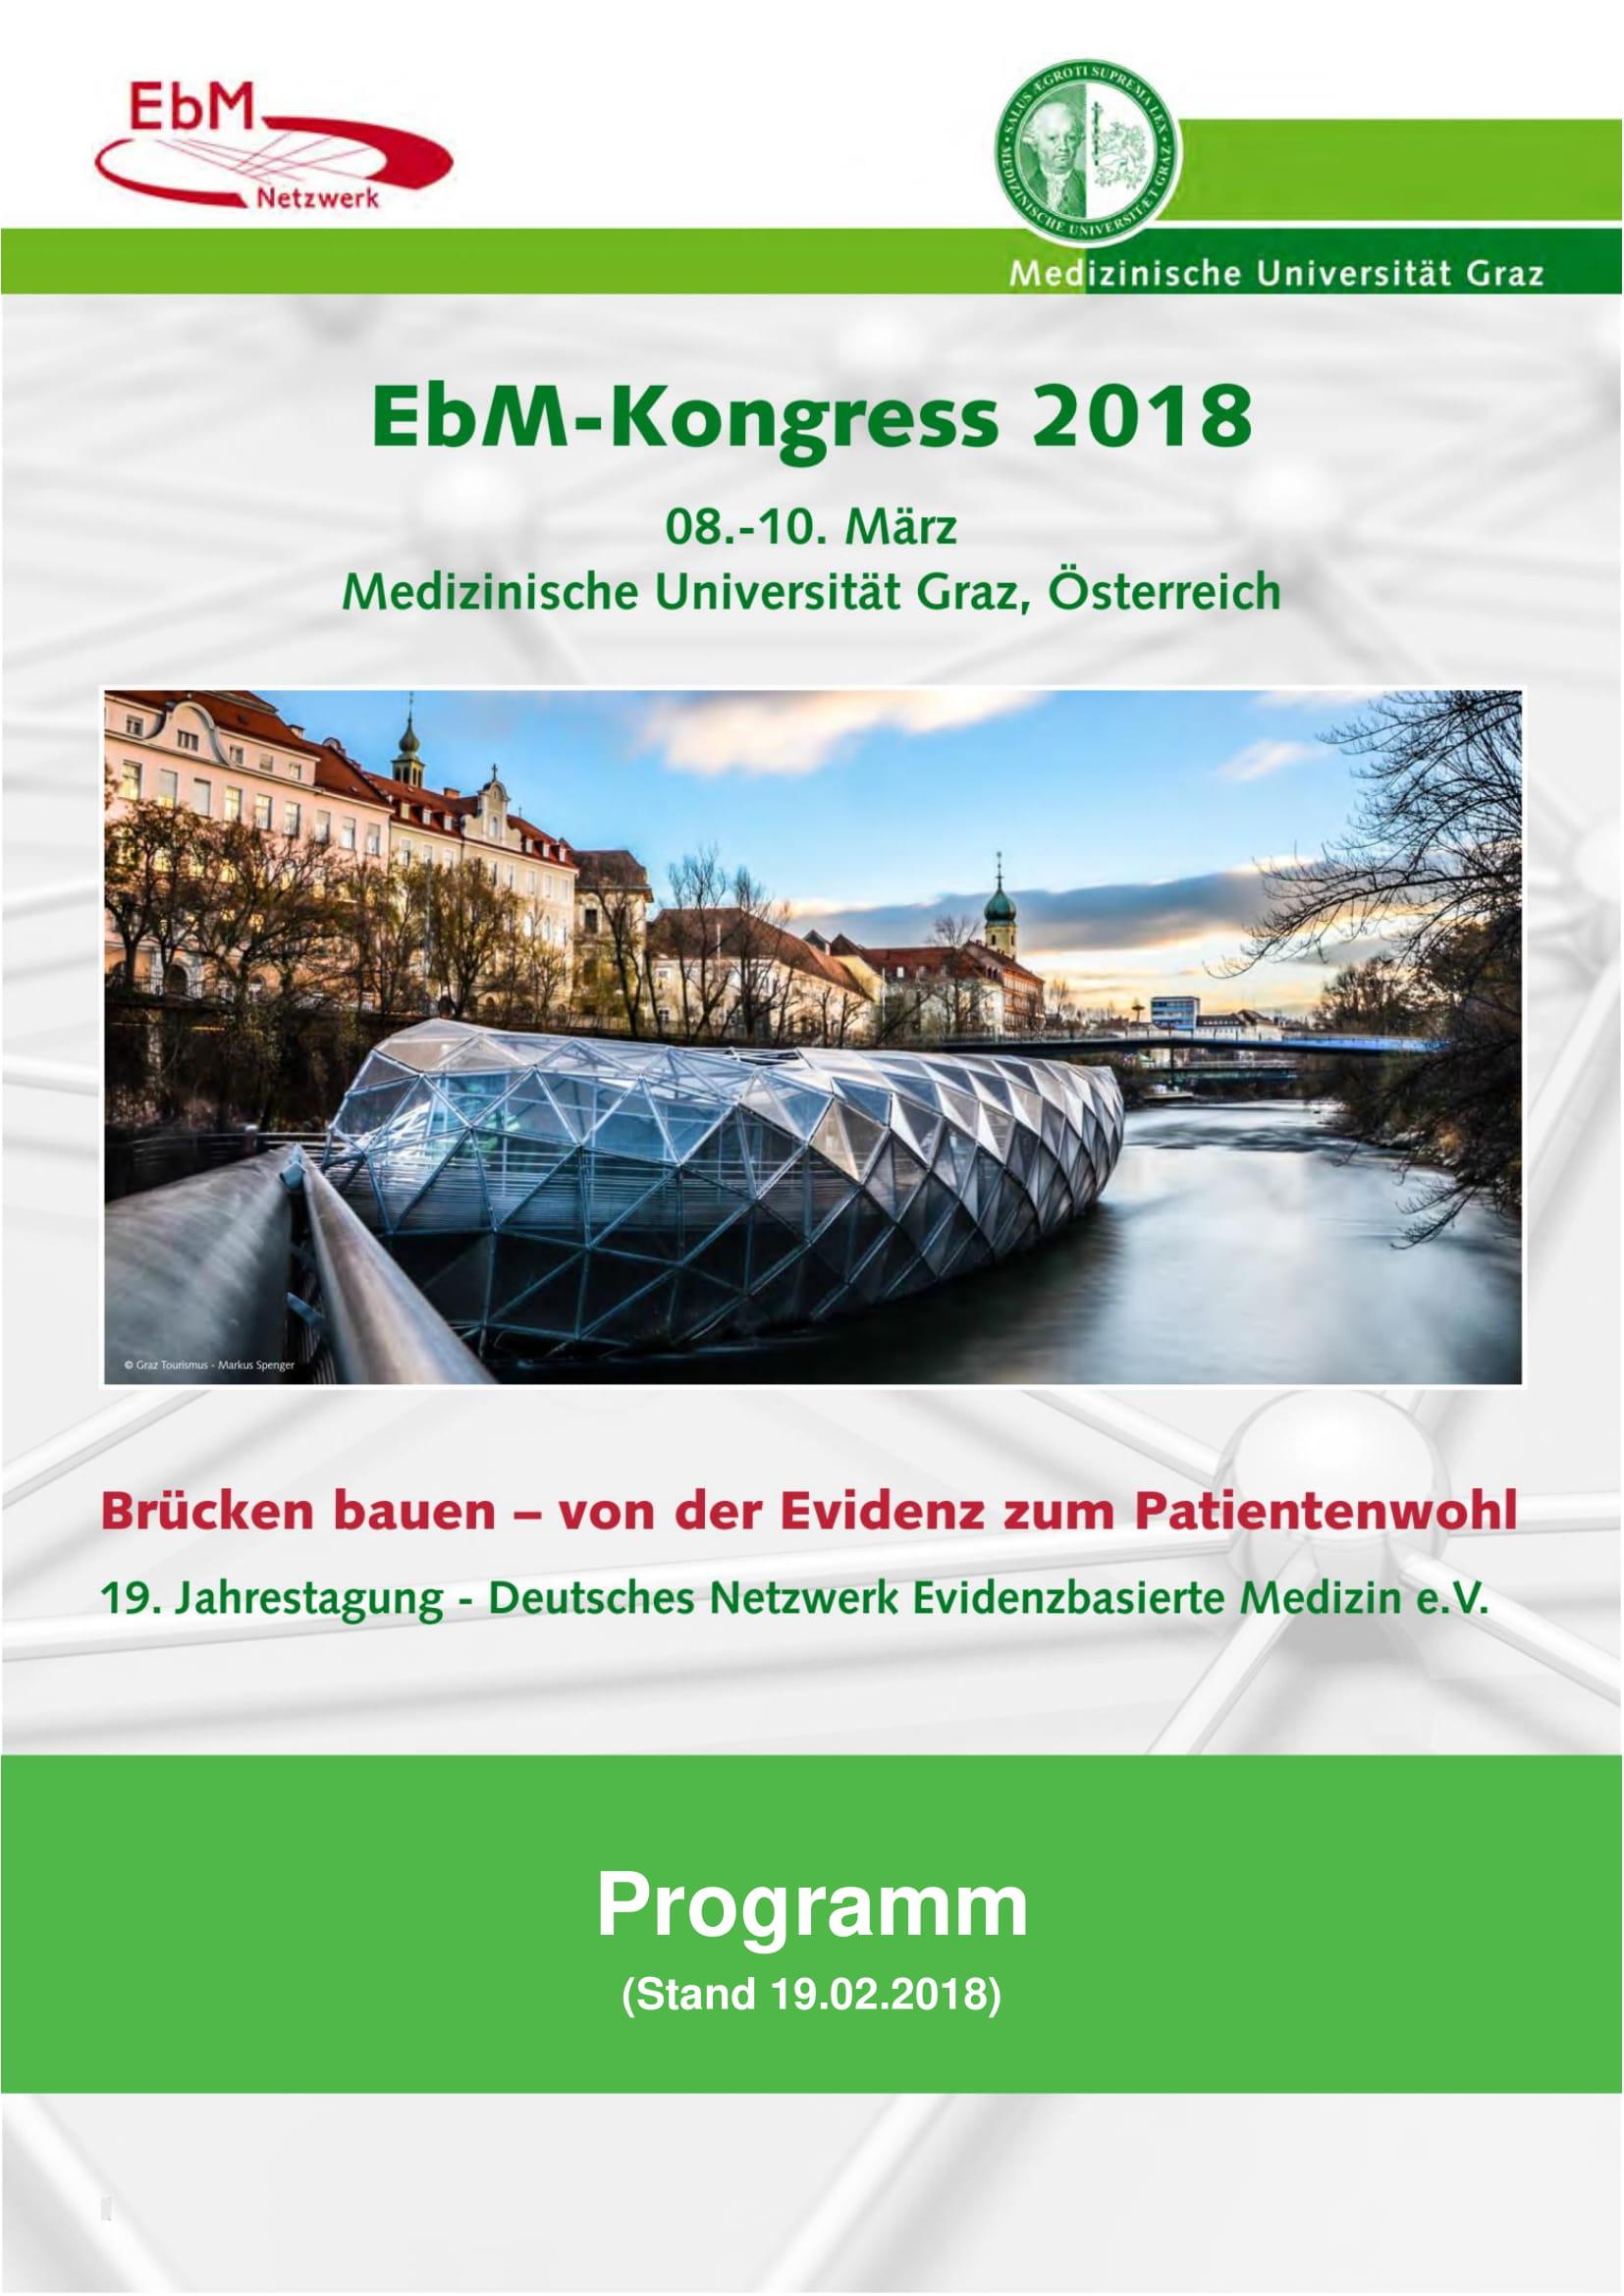 EbM2018-Programmheft-Deckblatt.jpg